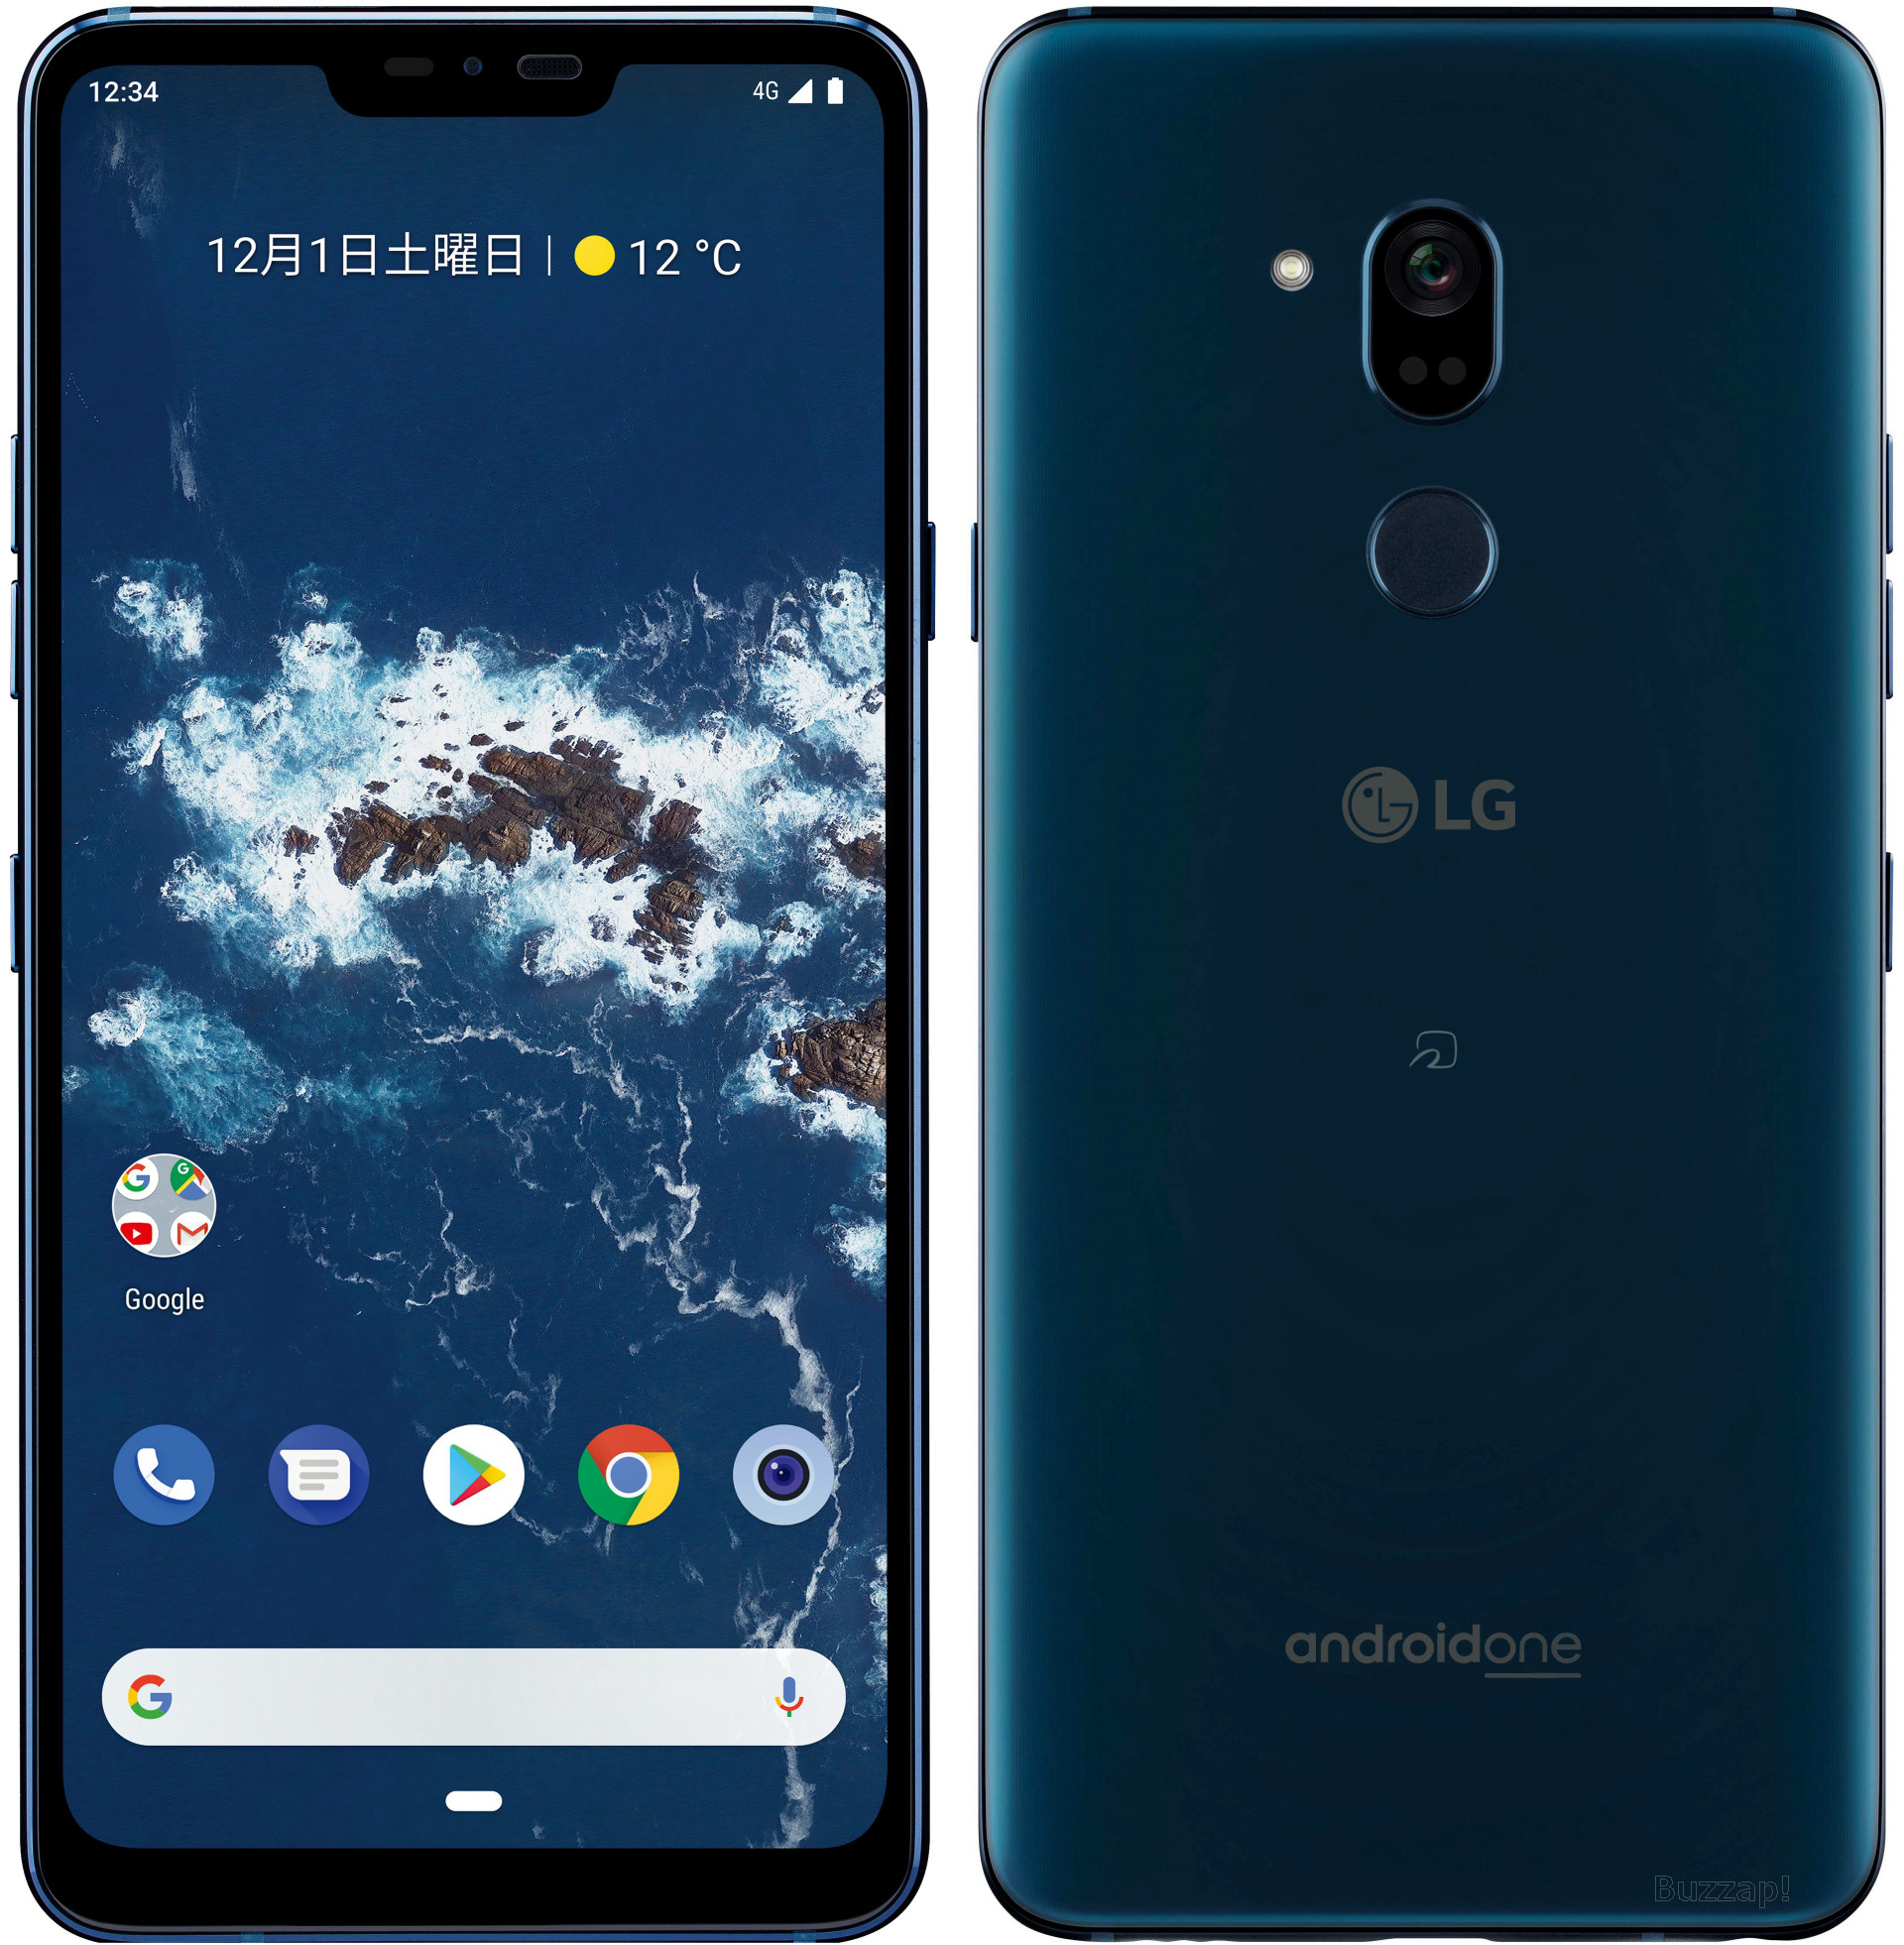 android 9 雺*lH:c!:g��9�-:)�